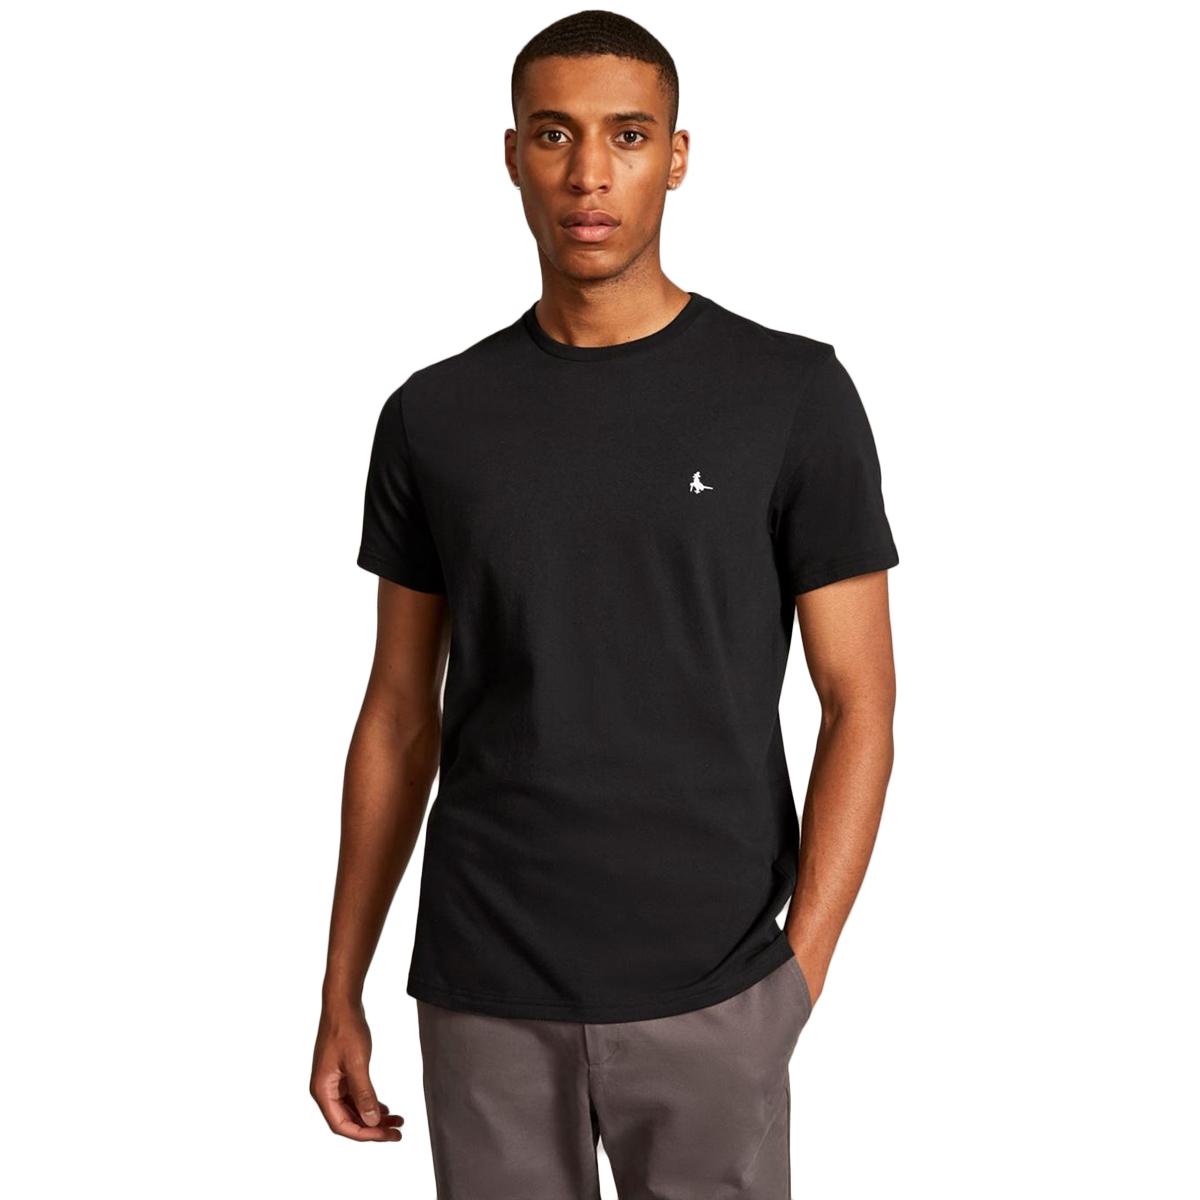 Jack Wills Men's Sandleford Basic Short-Sleeve Tee - Black, L